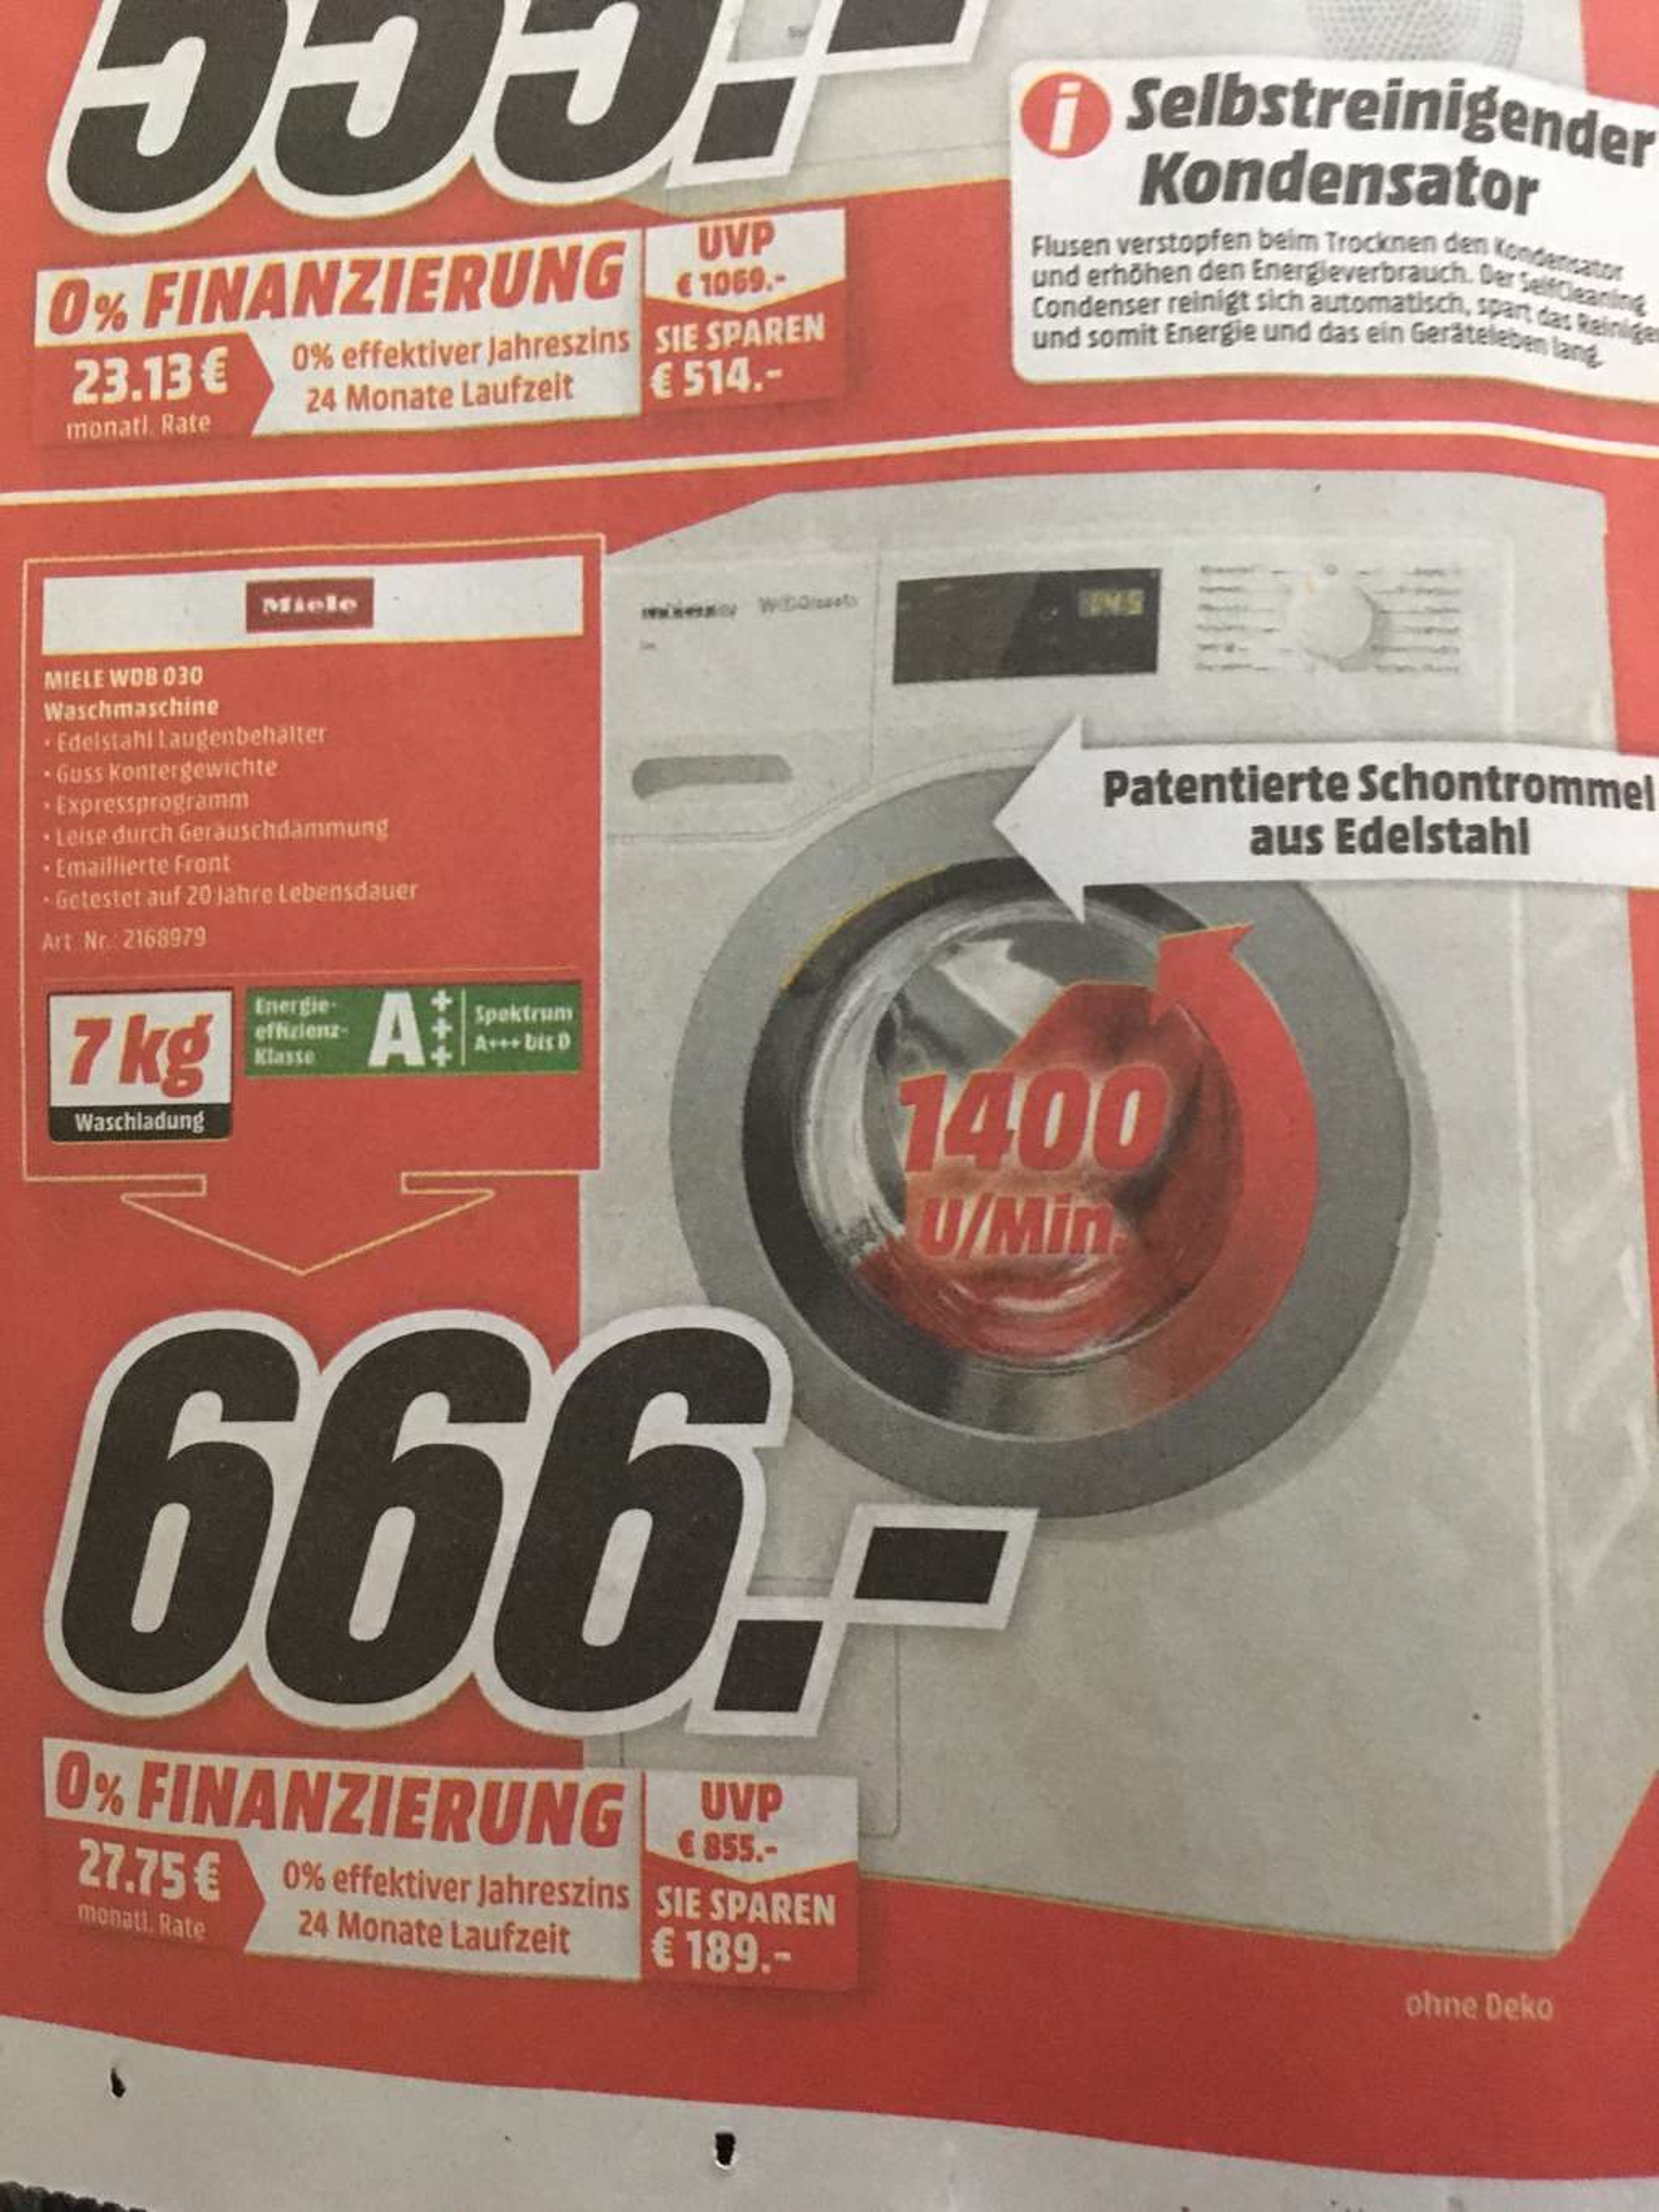 lokal mm essen miele wdb 030 waschmaschine. Black Bedroom Furniture Sets. Home Design Ideas